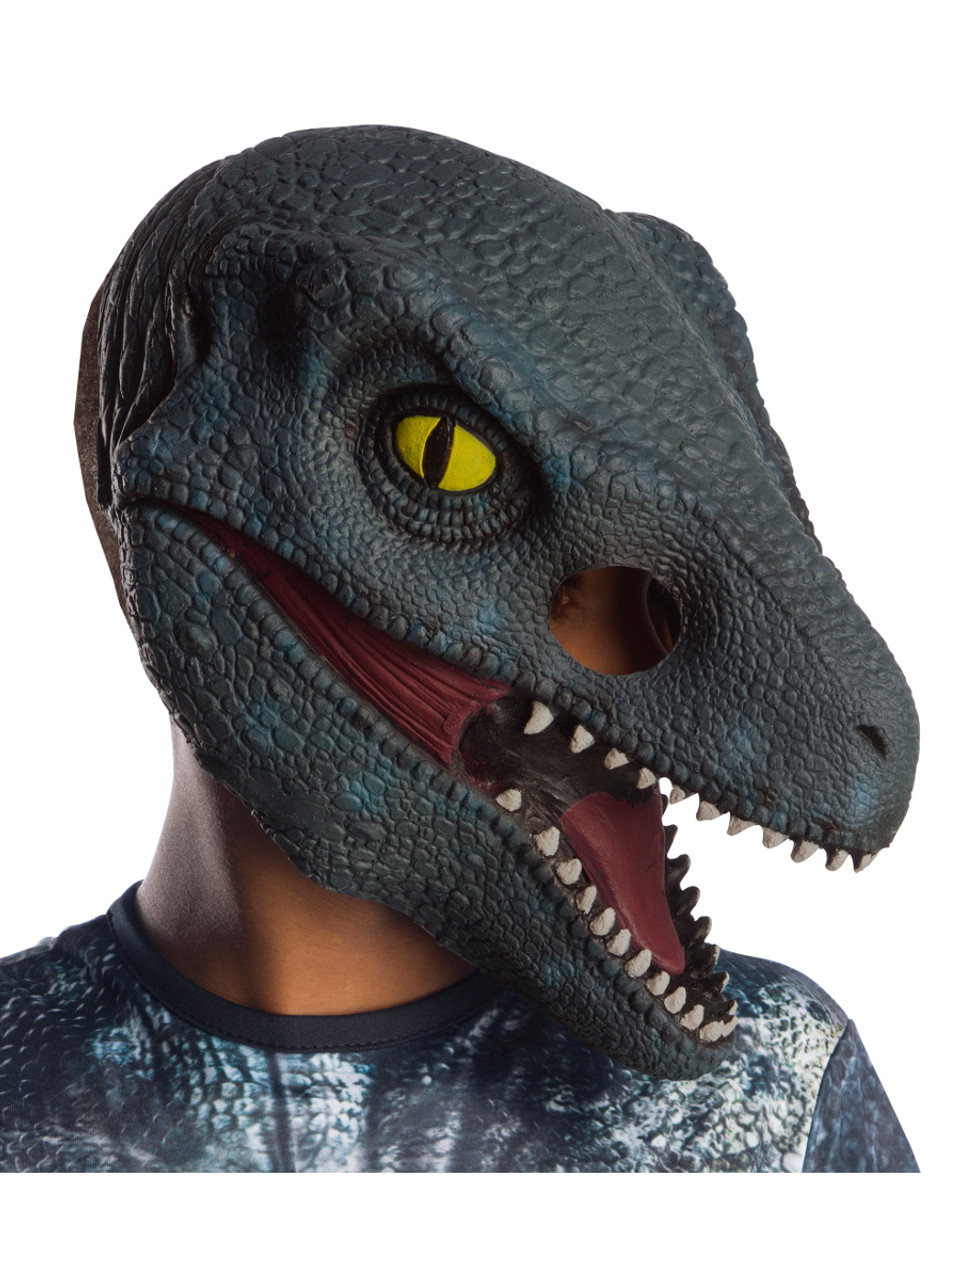 prix incroyable prix incroyables trouver le travail Jurassic World Blue Velociraptor Kid's 3/4 Mask